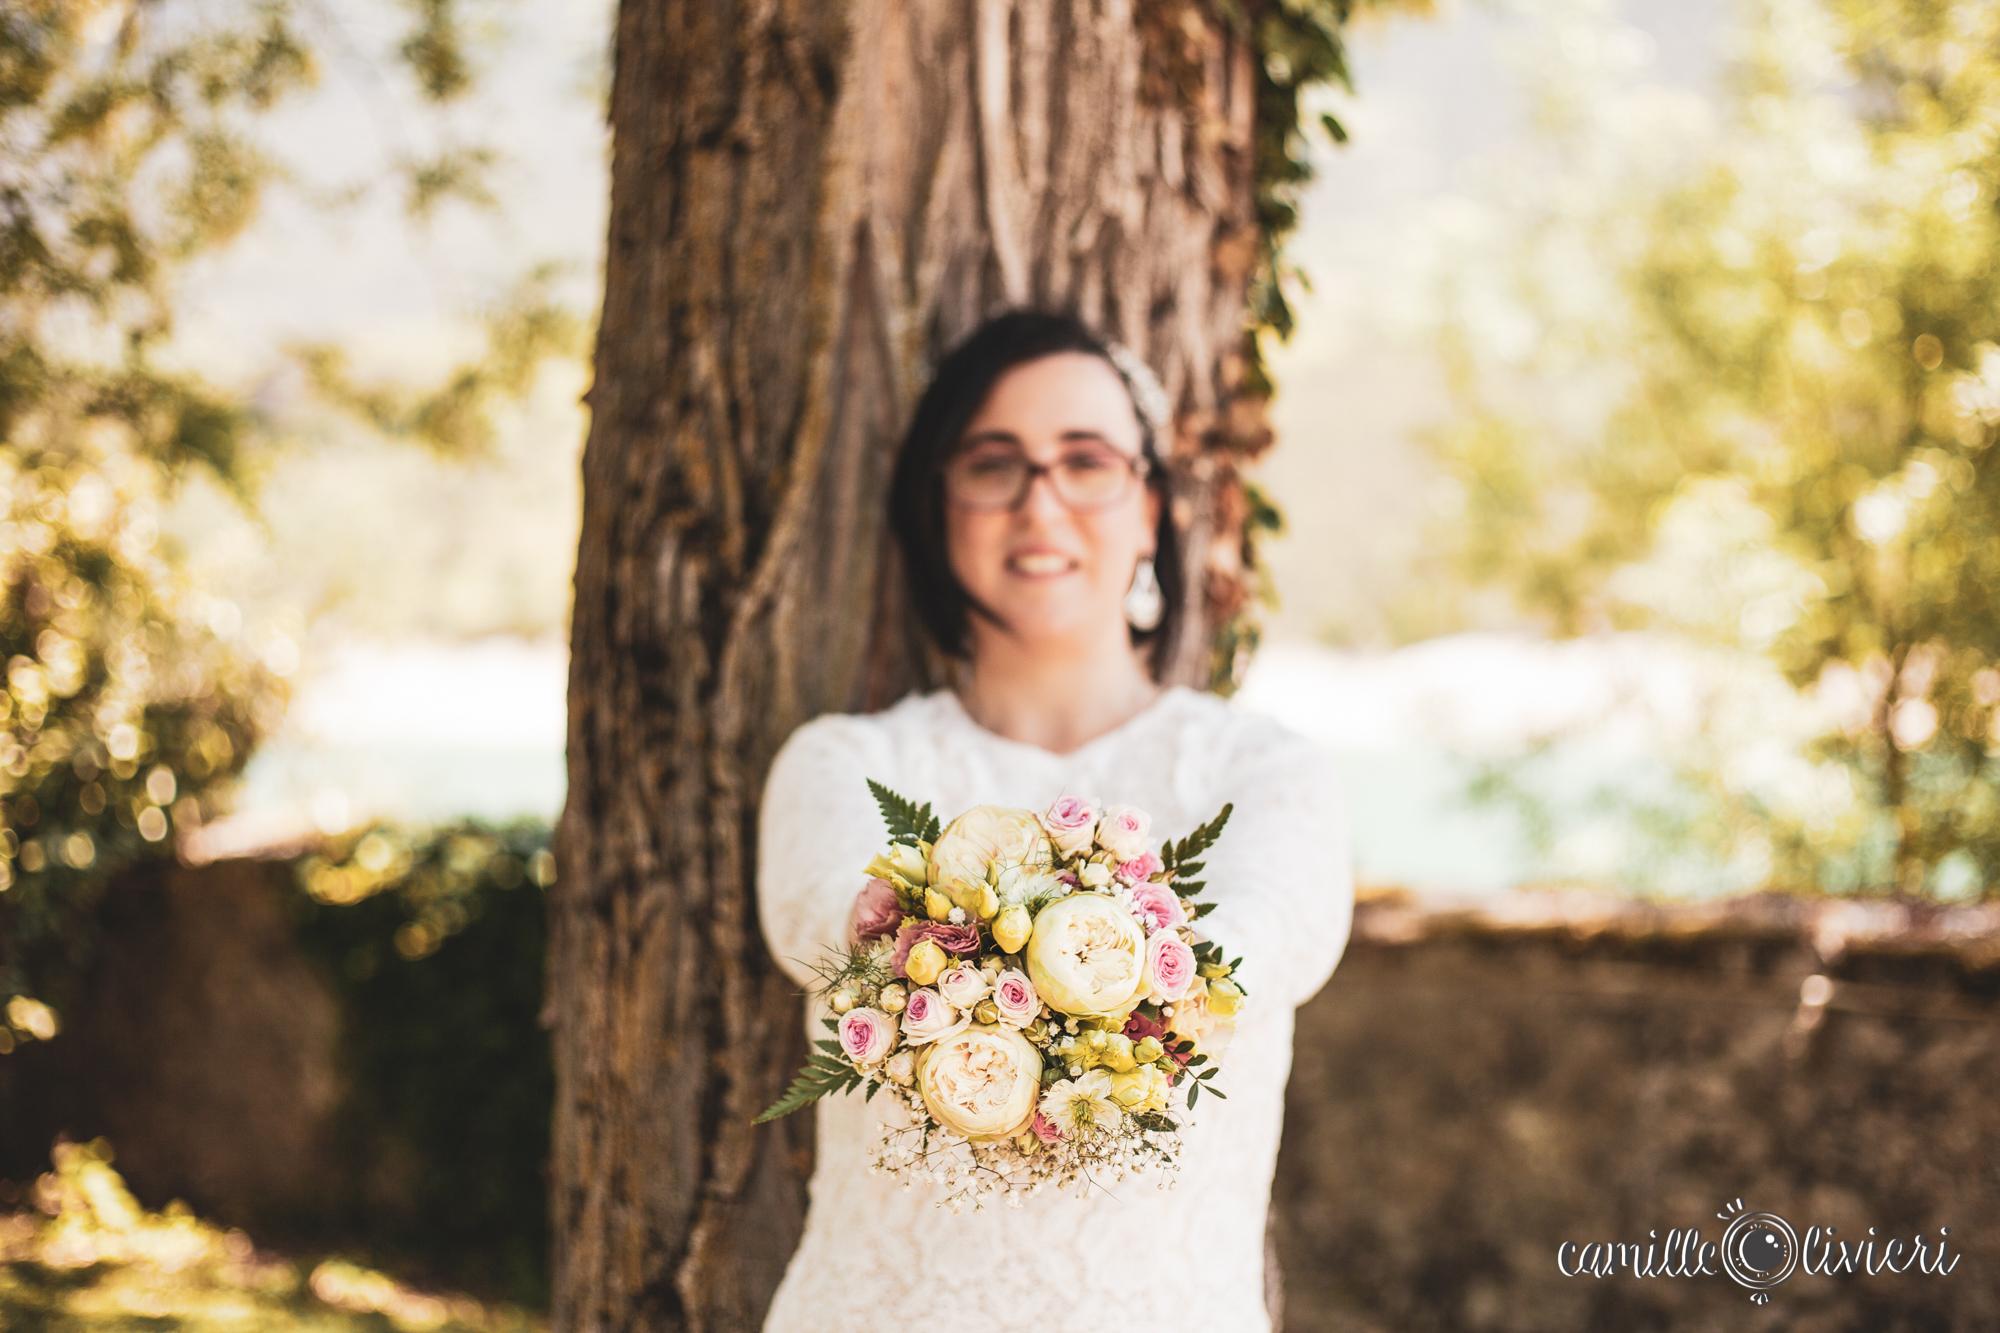 photographe_grenoble_mariage-camille-olivieri-57